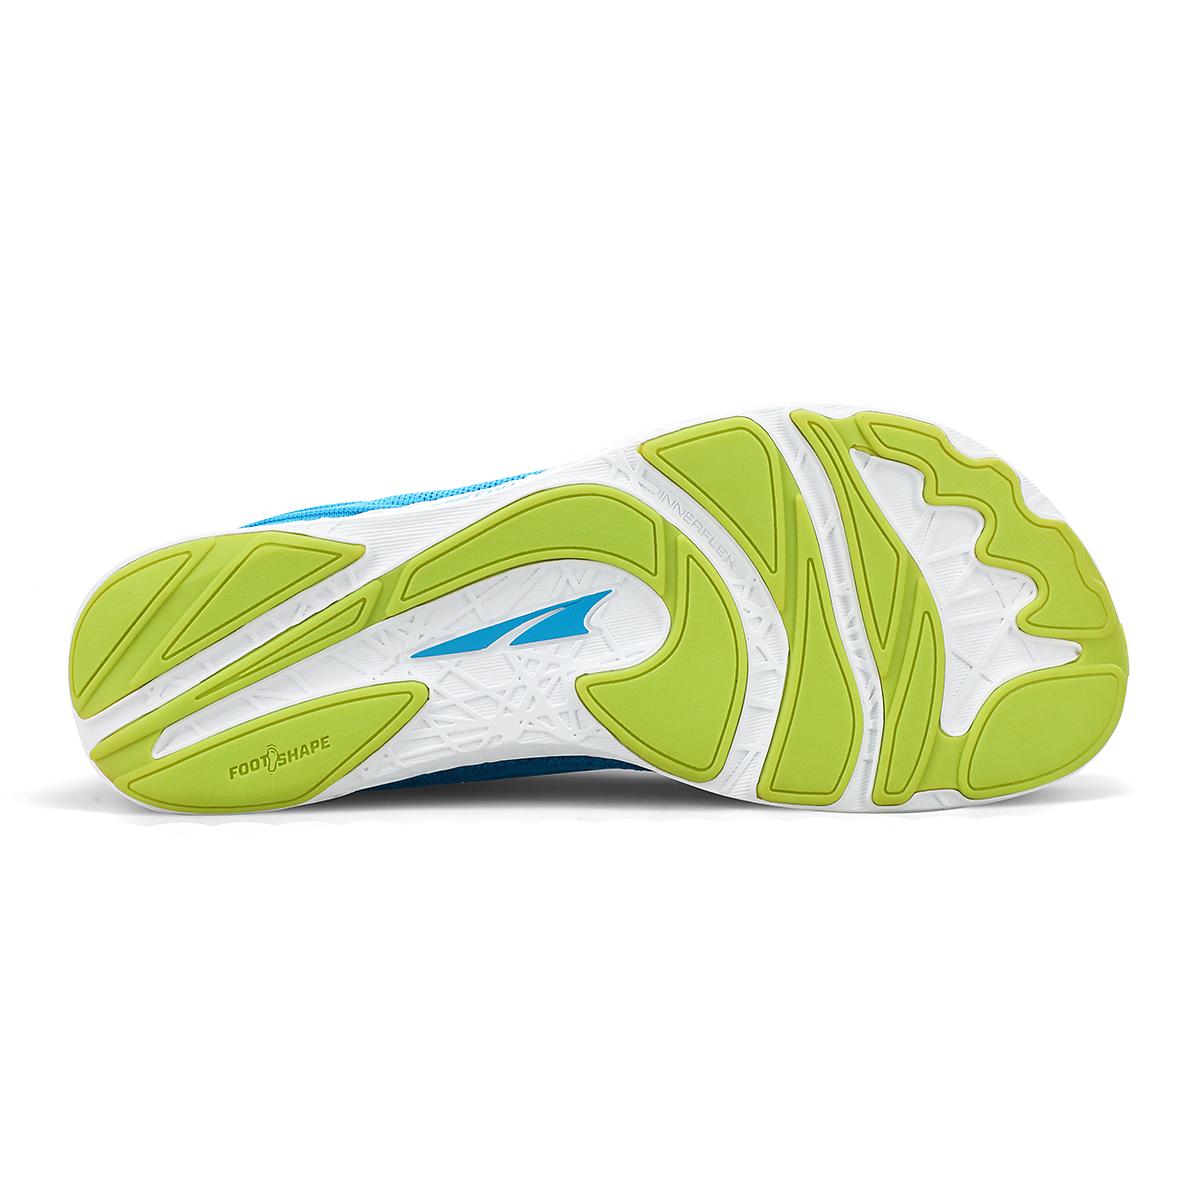 Men's Altra Escalante 2.5 Running Shoe - Color: Blue/Lime - Size: 7 - Width: Regular, Blue/Lime, large, image 4